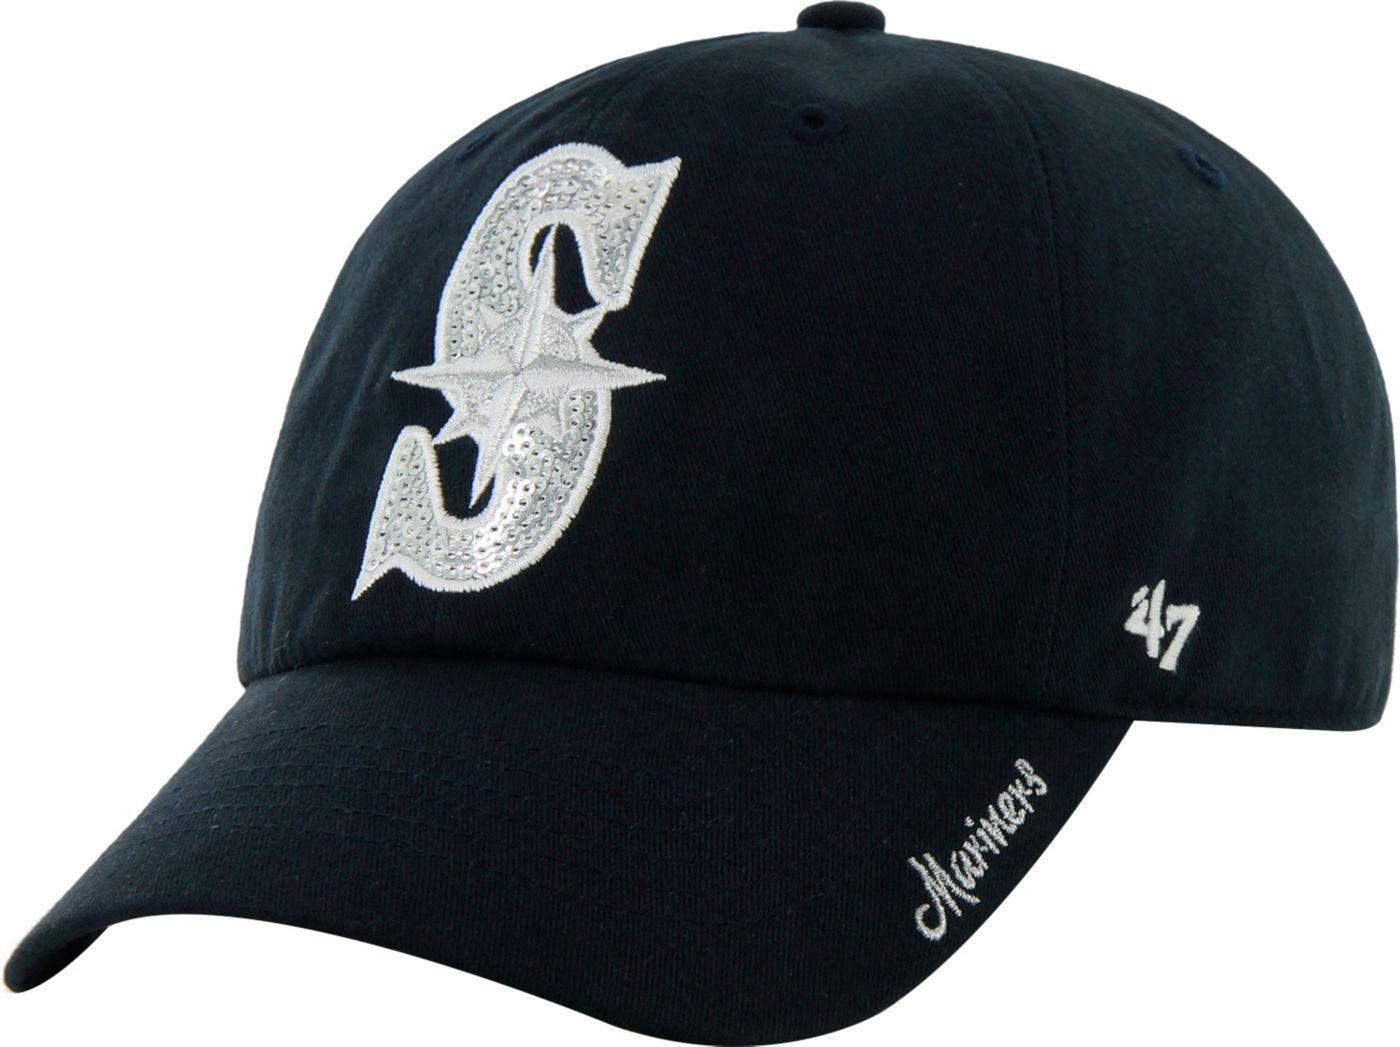 '47 Women's Seattle Mariners Sparkle Navy Adjustable Hat